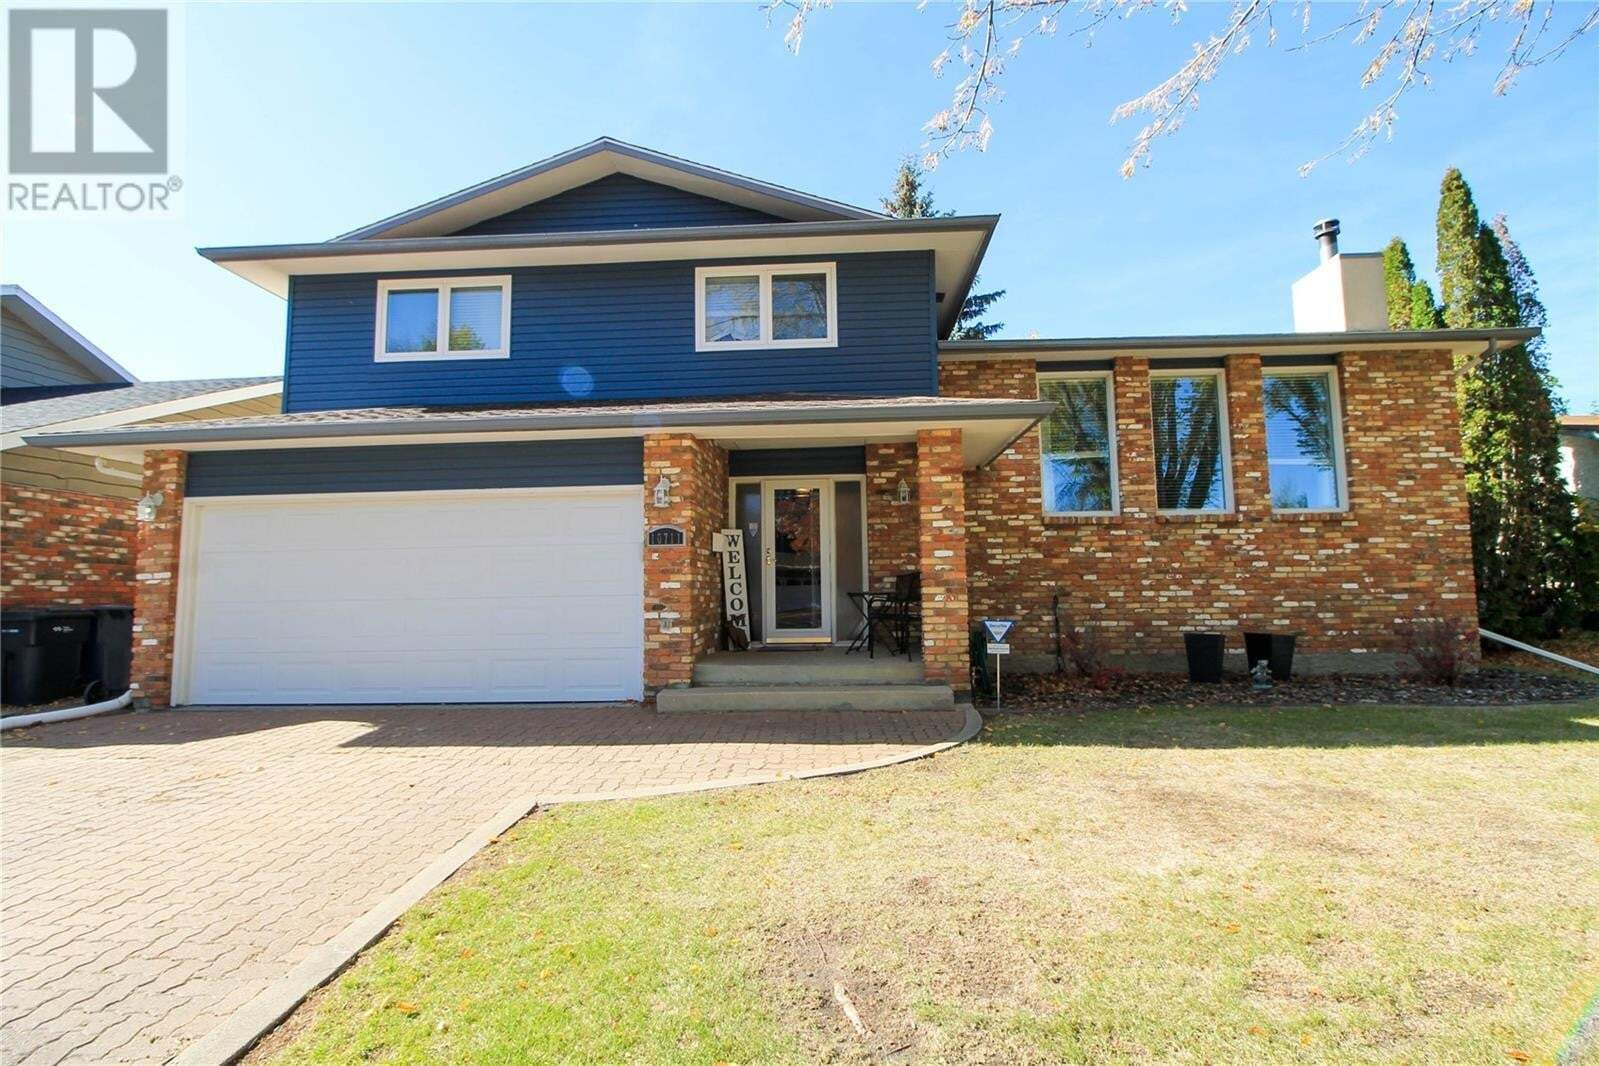 House for sale at 10711 Meighen Cres North Battleford Saskatchewan - MLS: SK828799